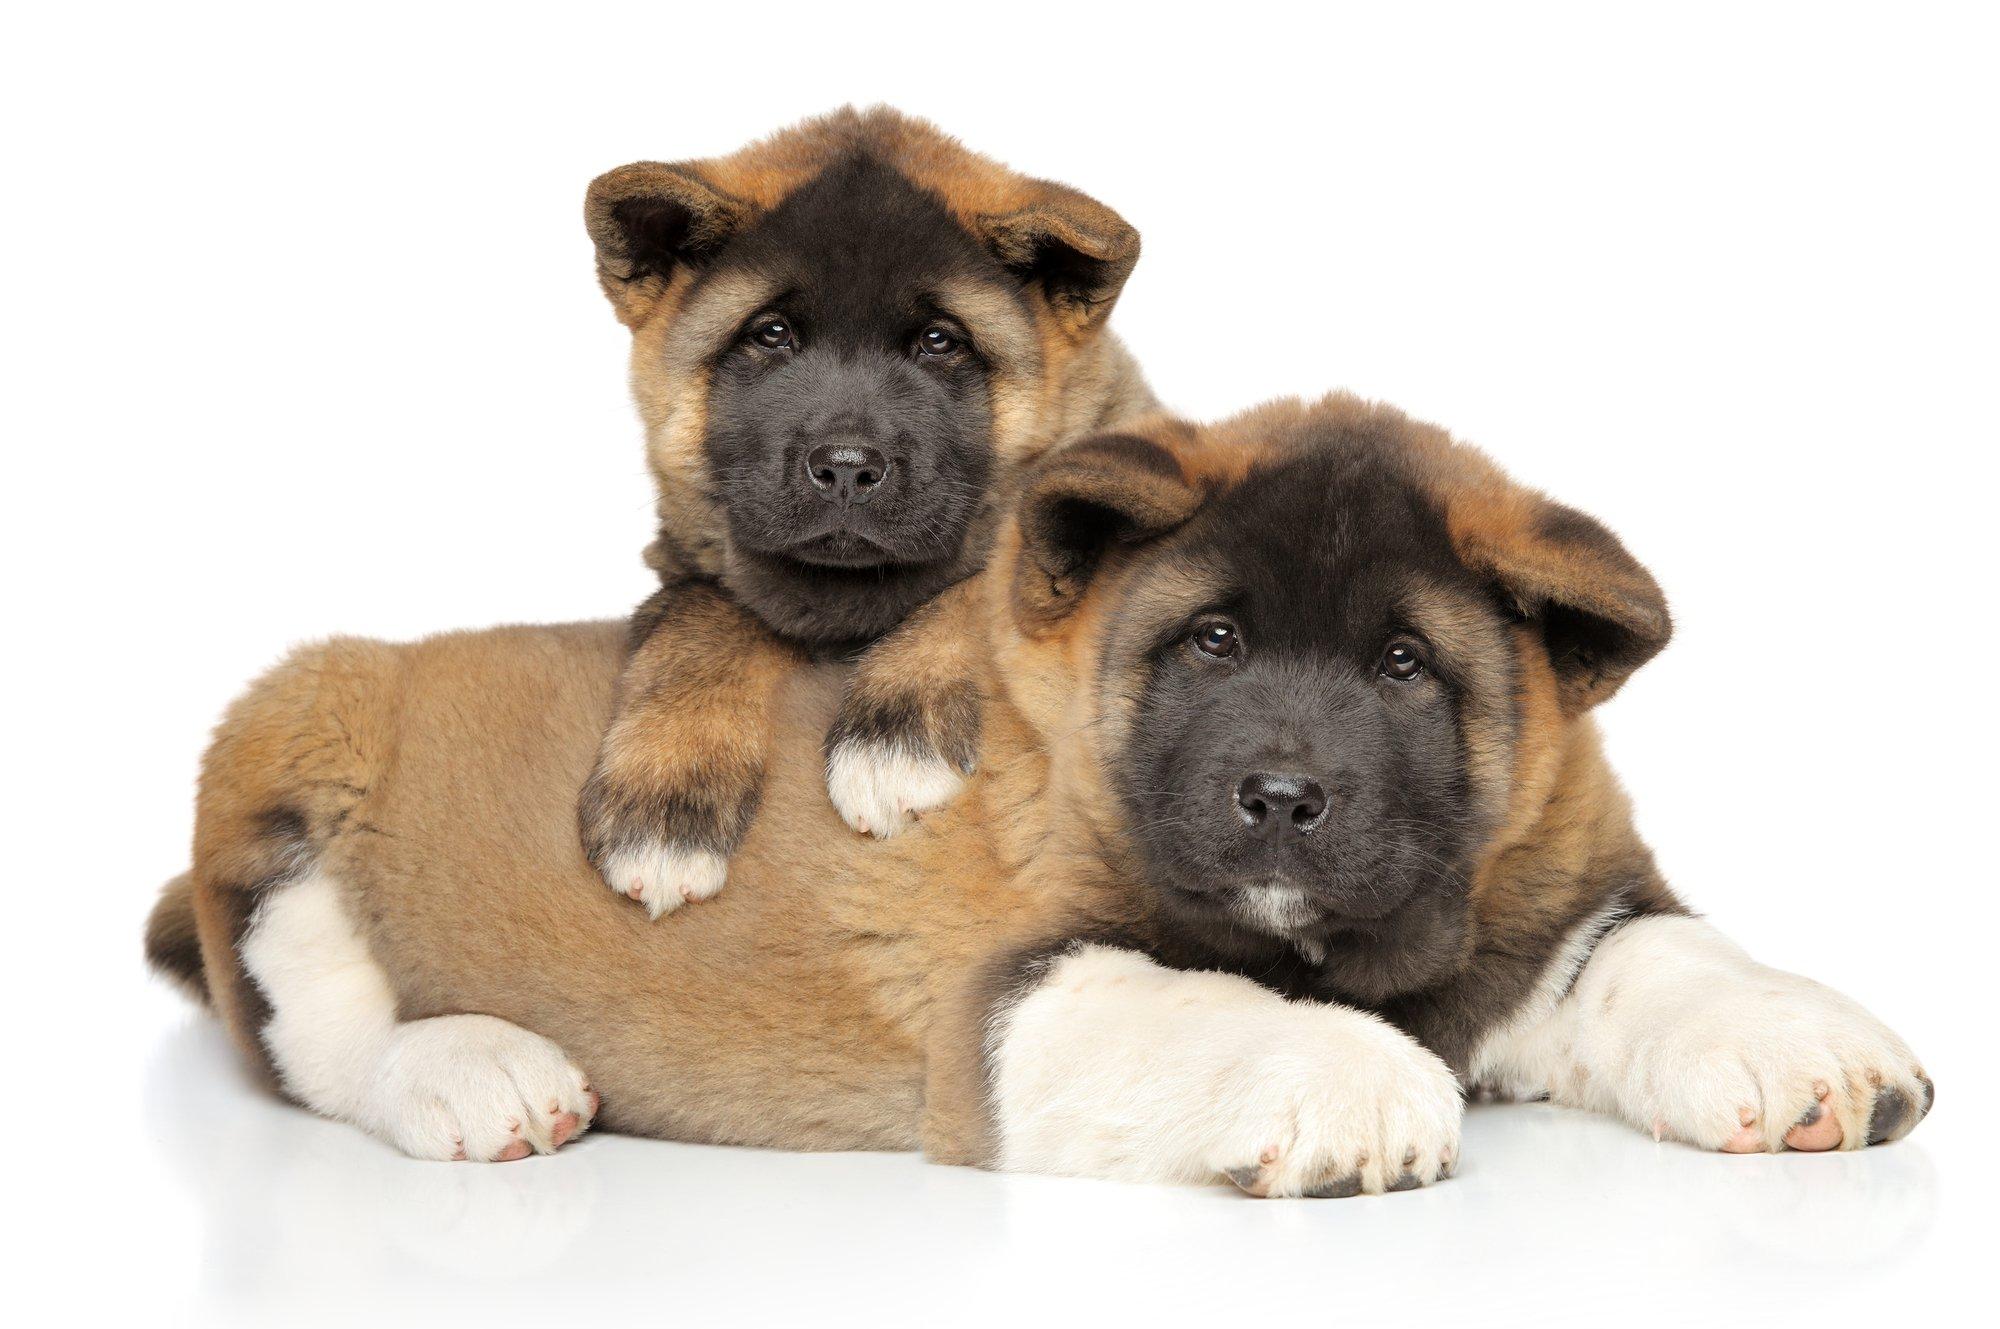 2 American Akita puppies that look like bears